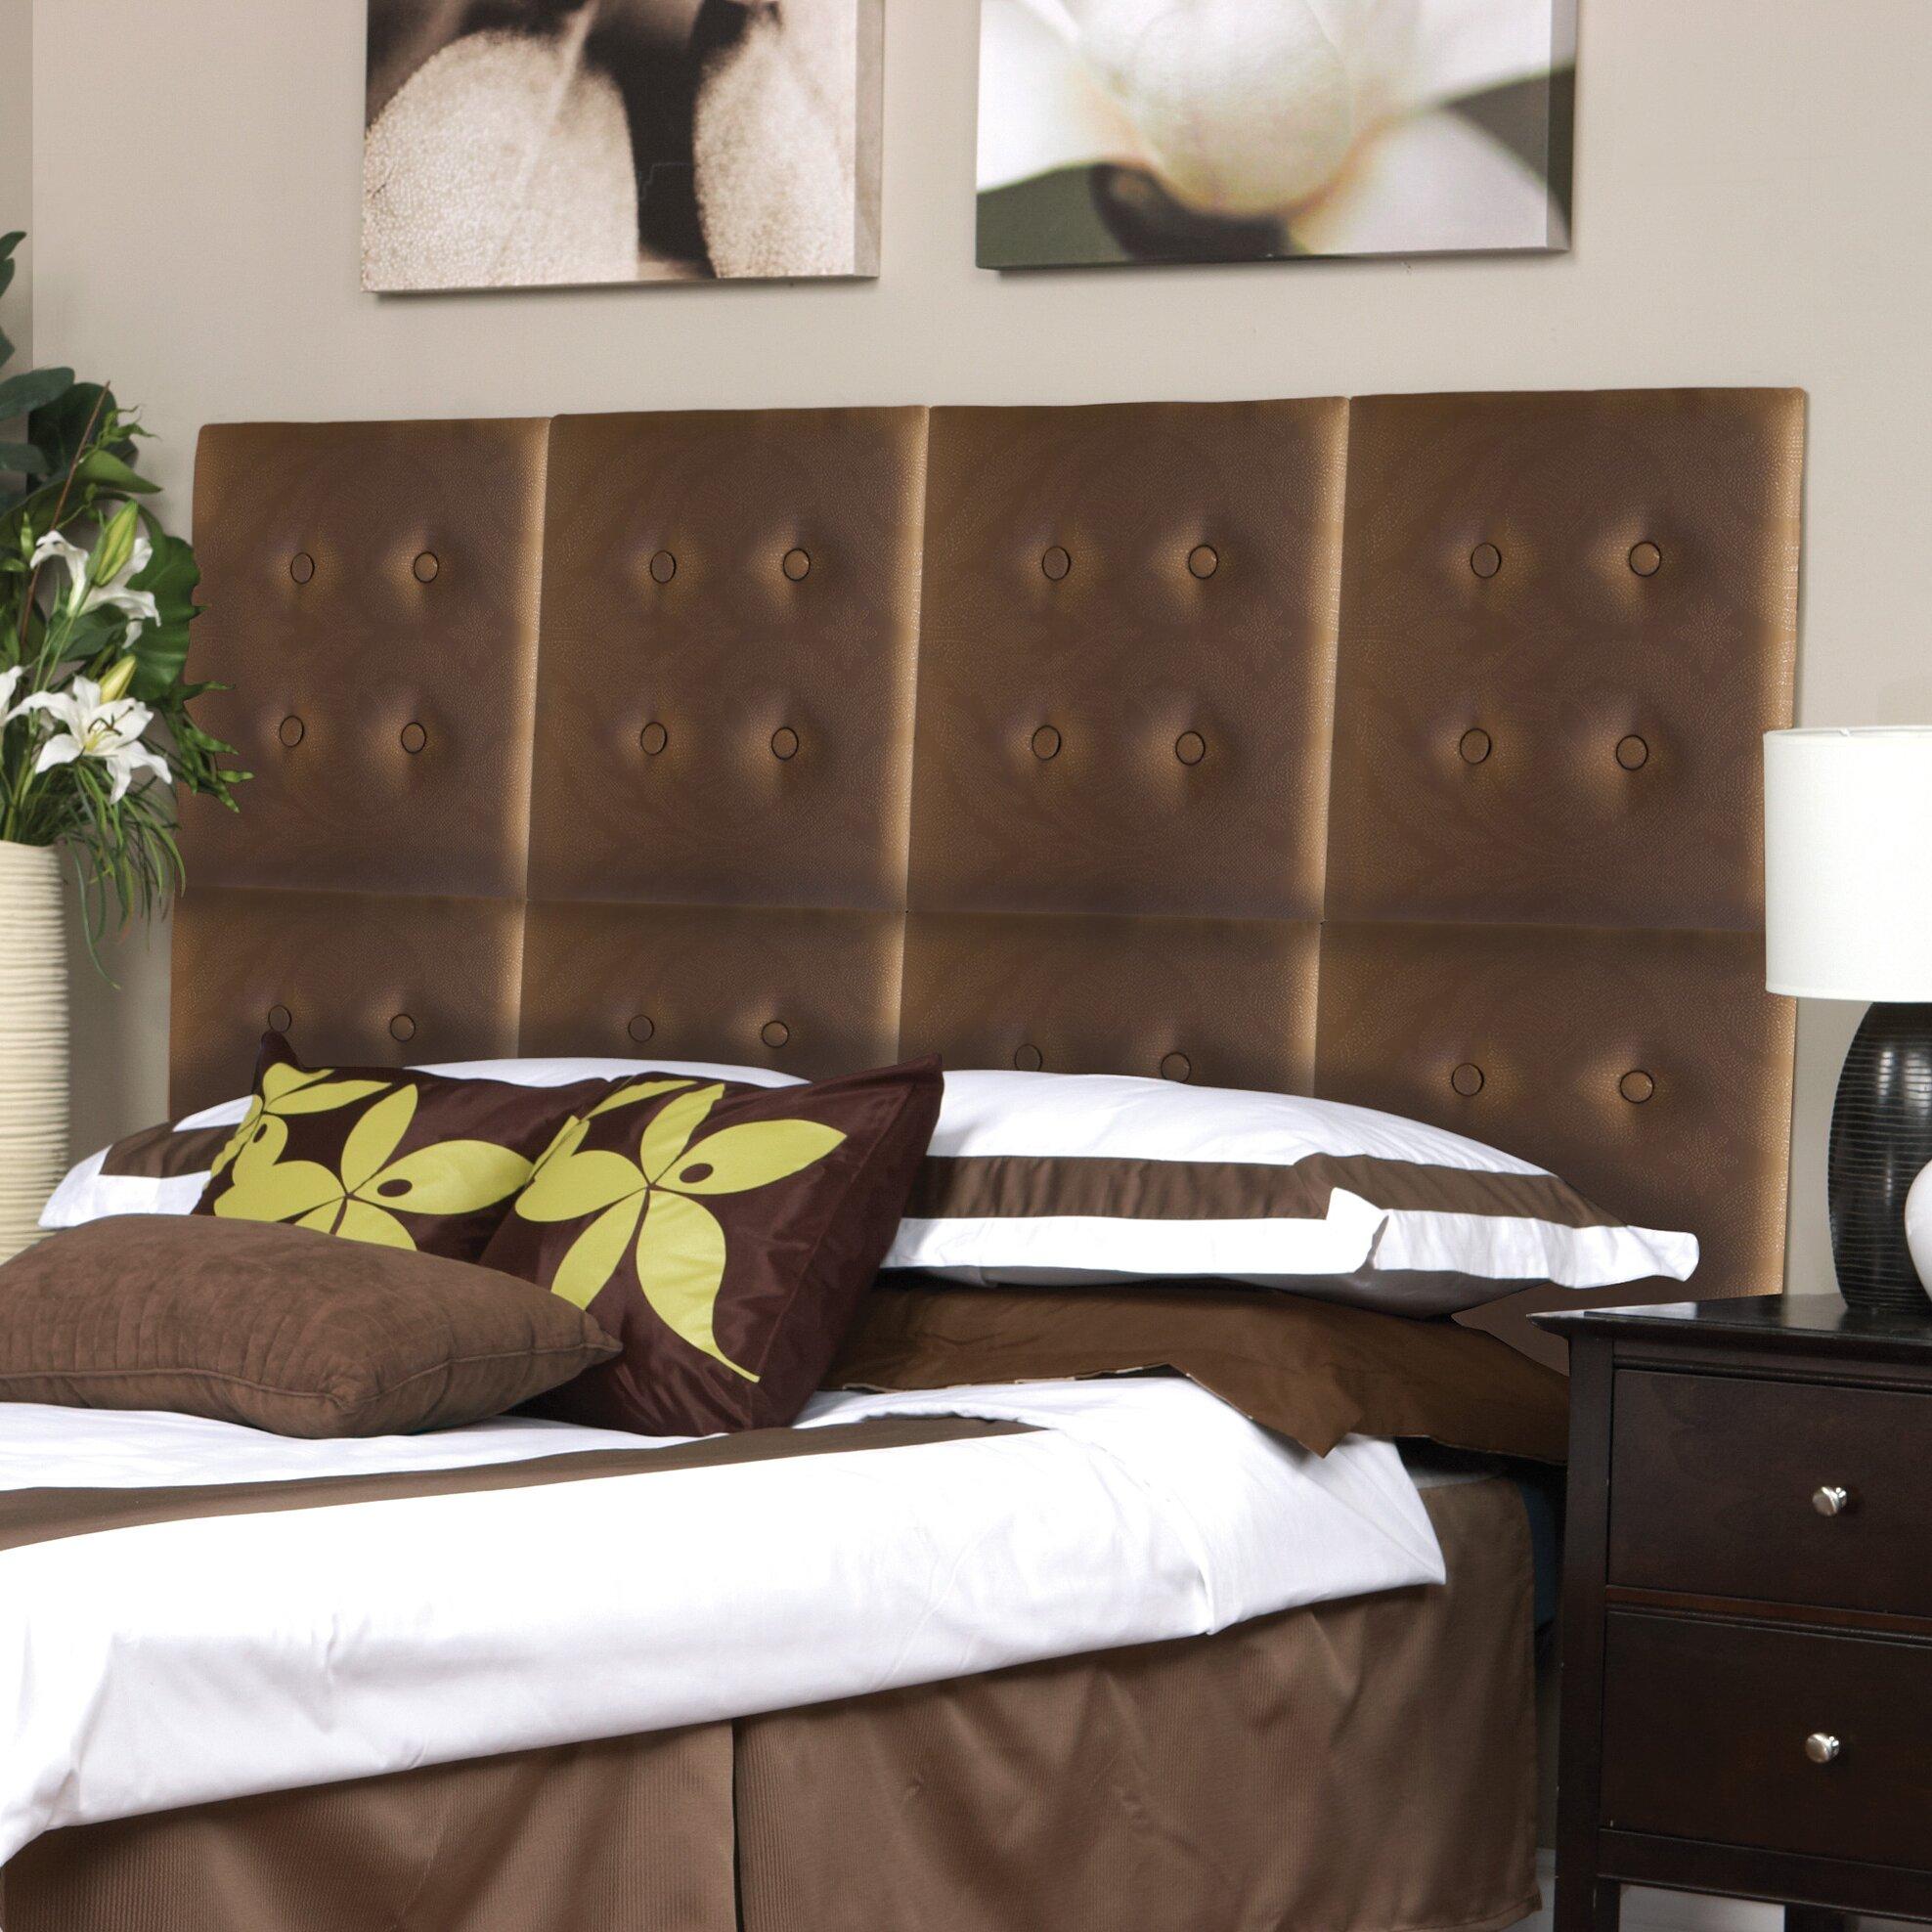 nexxt design luxe upholstered headboard reviews wayfair. Black Bedroom Furniture Sets. Home Design Ideas